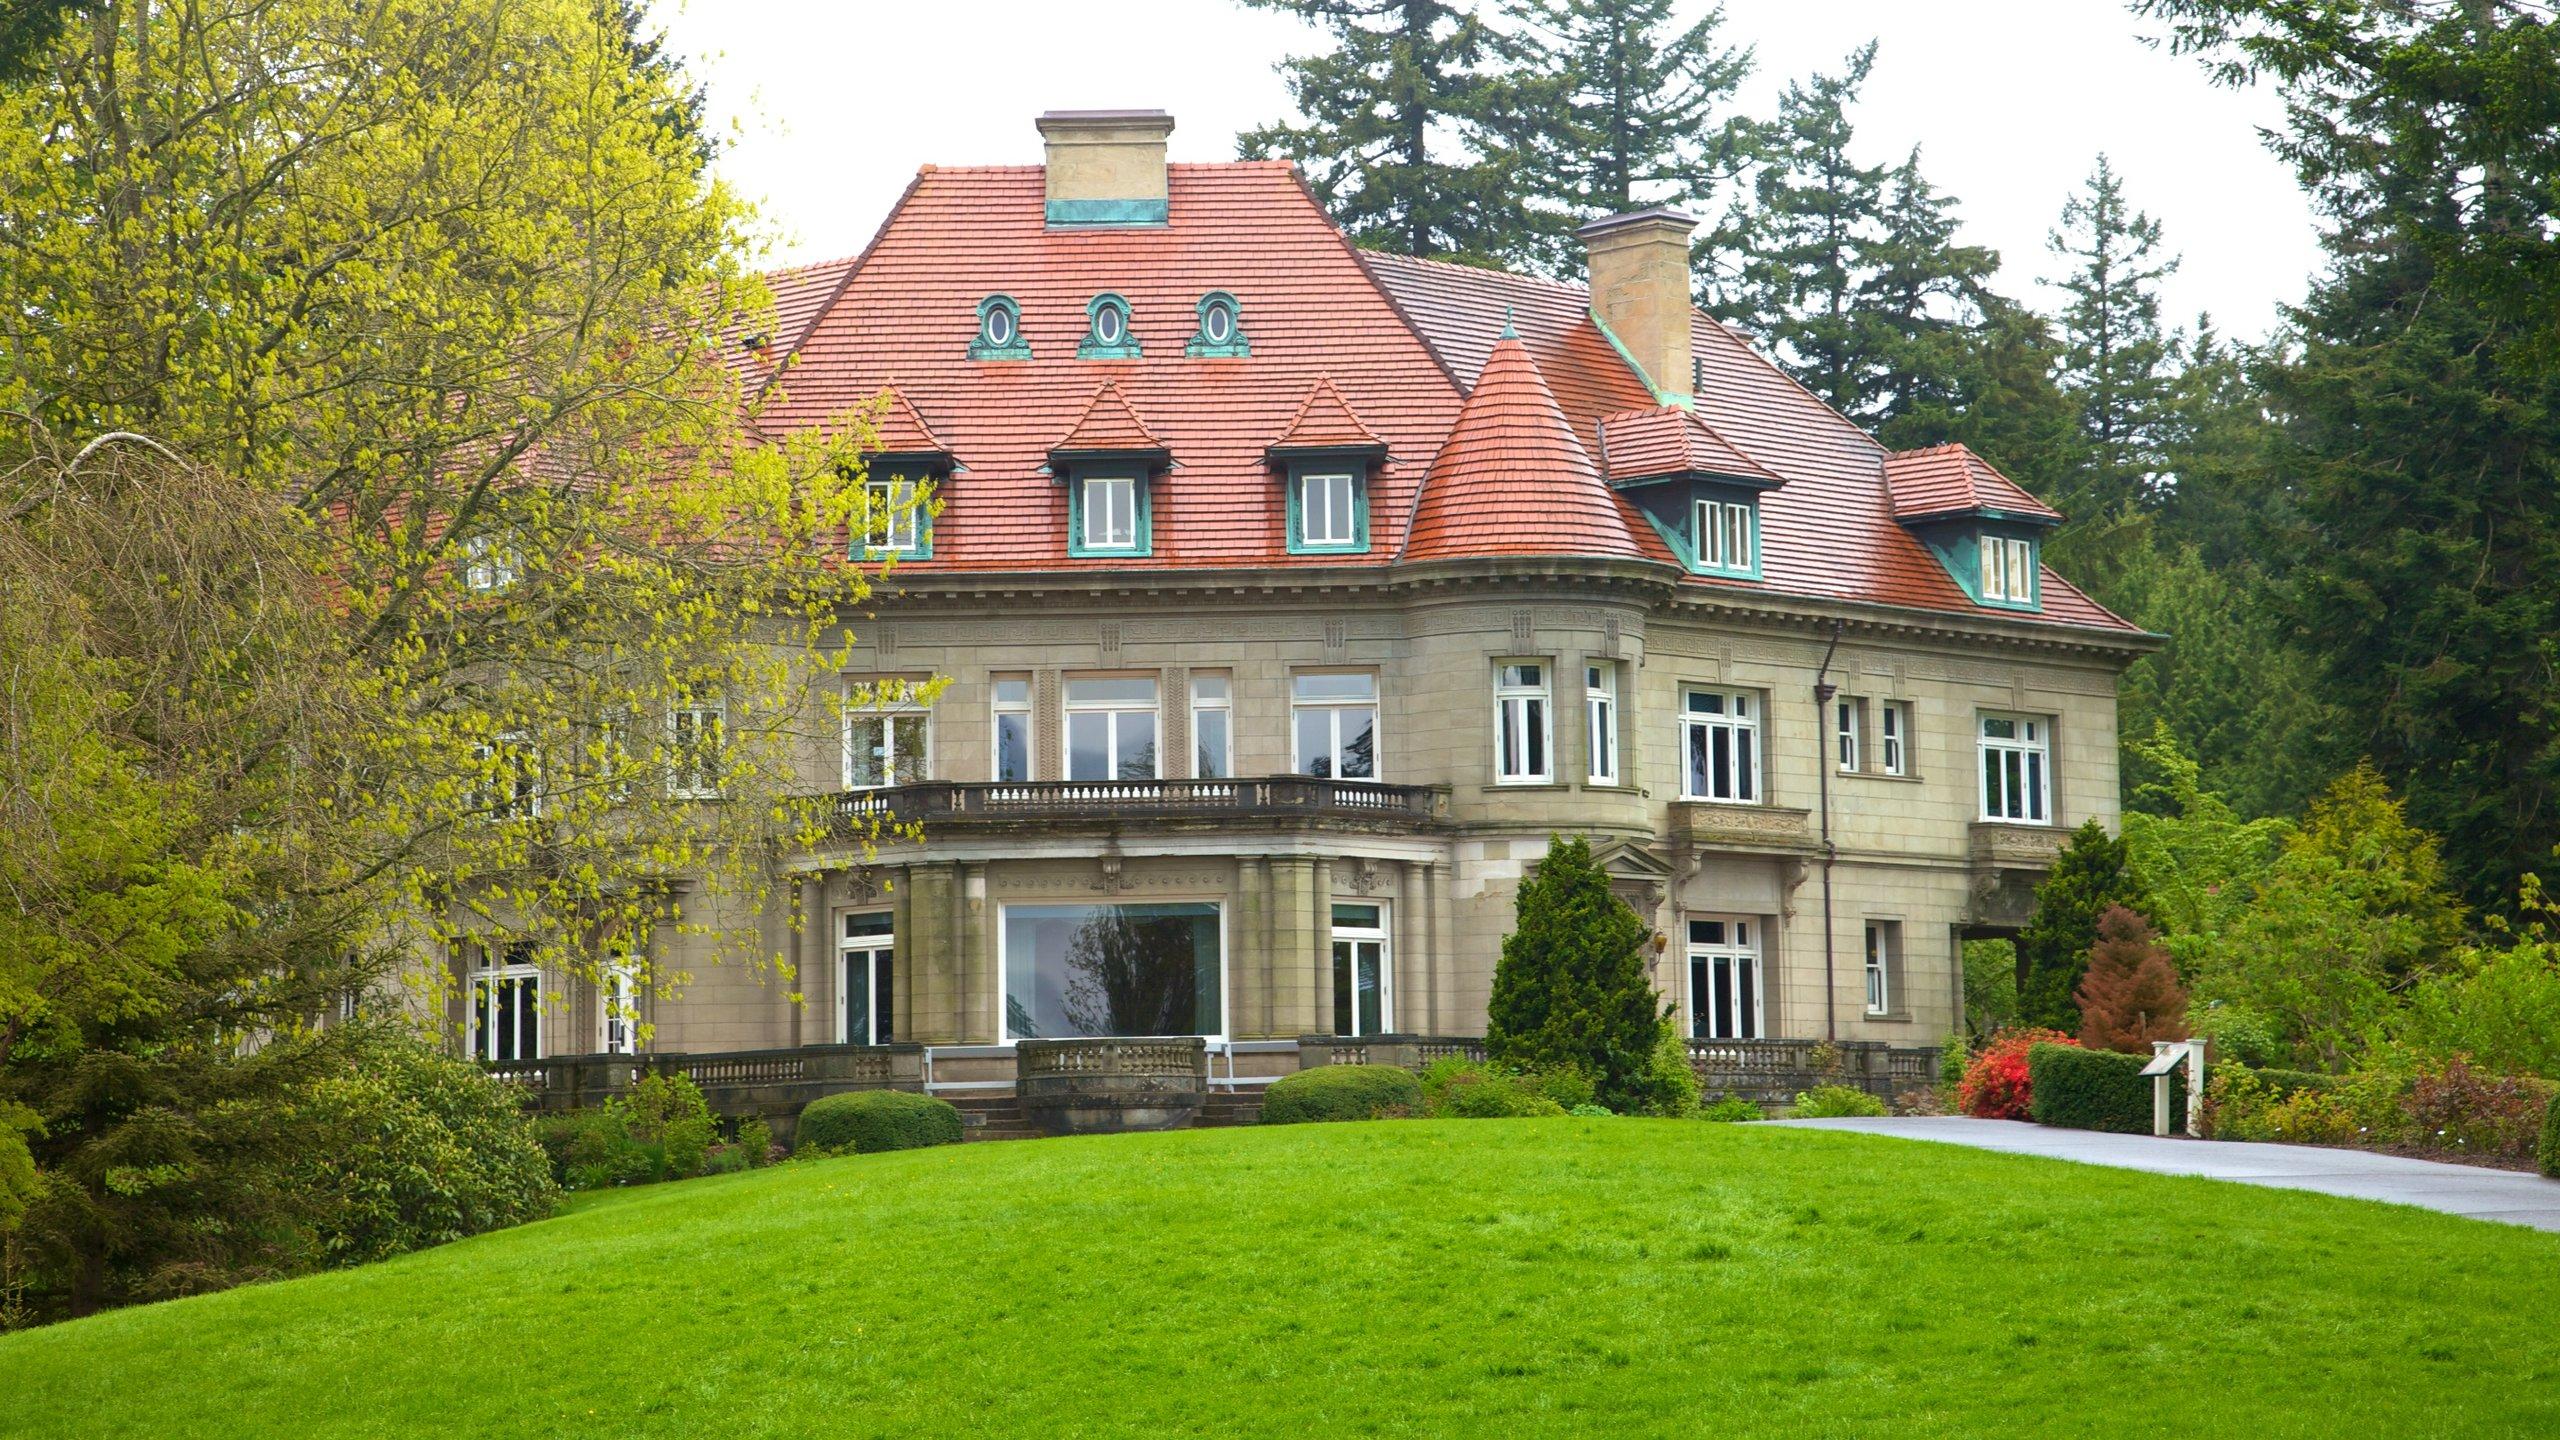 Pittock Mansion, Hillside, Oregon, United States of America